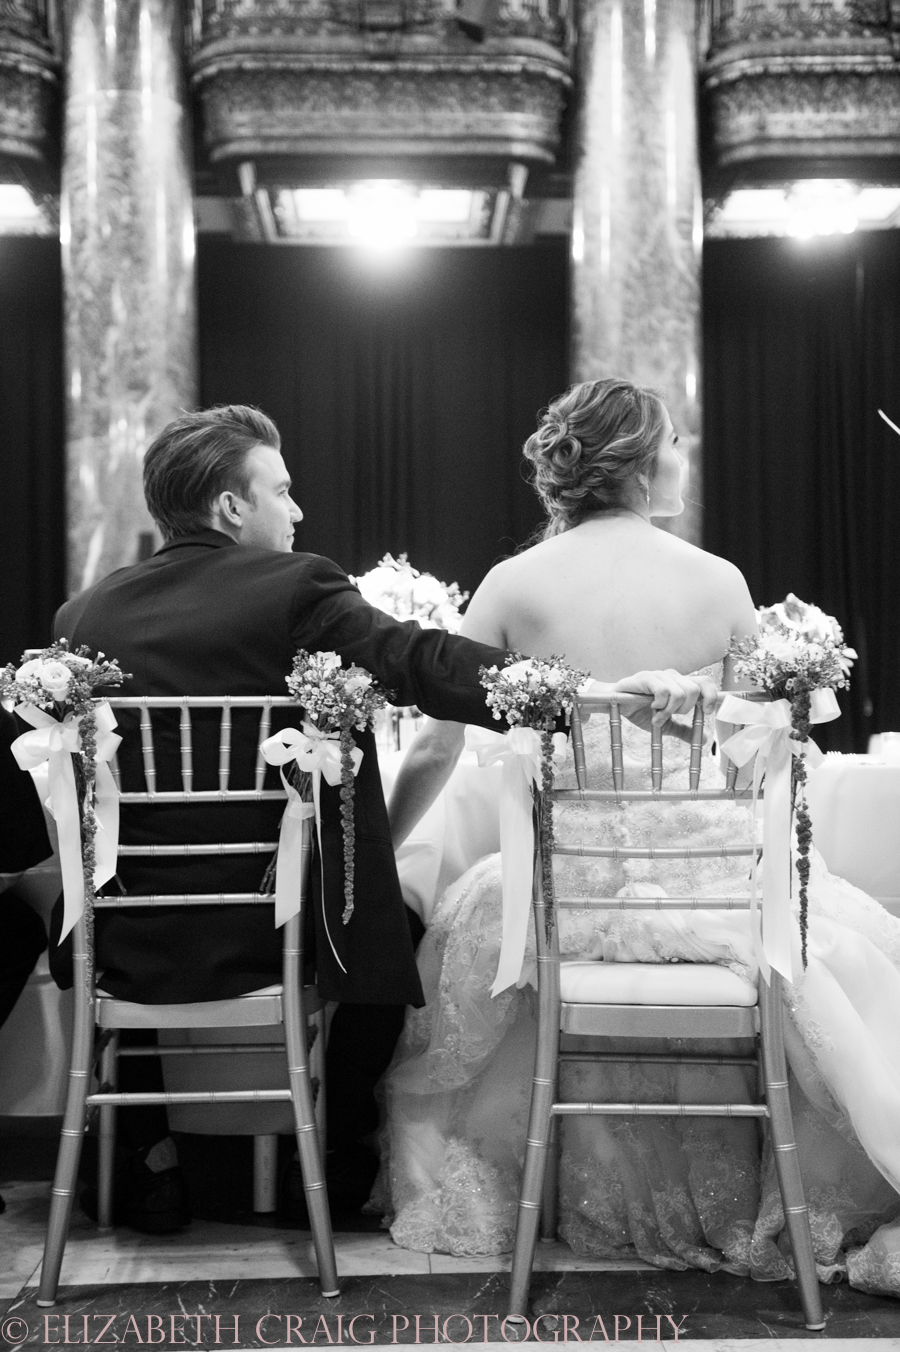 Carnegie Museum of Art Weddings | Elizabeth Craig Photography-0113